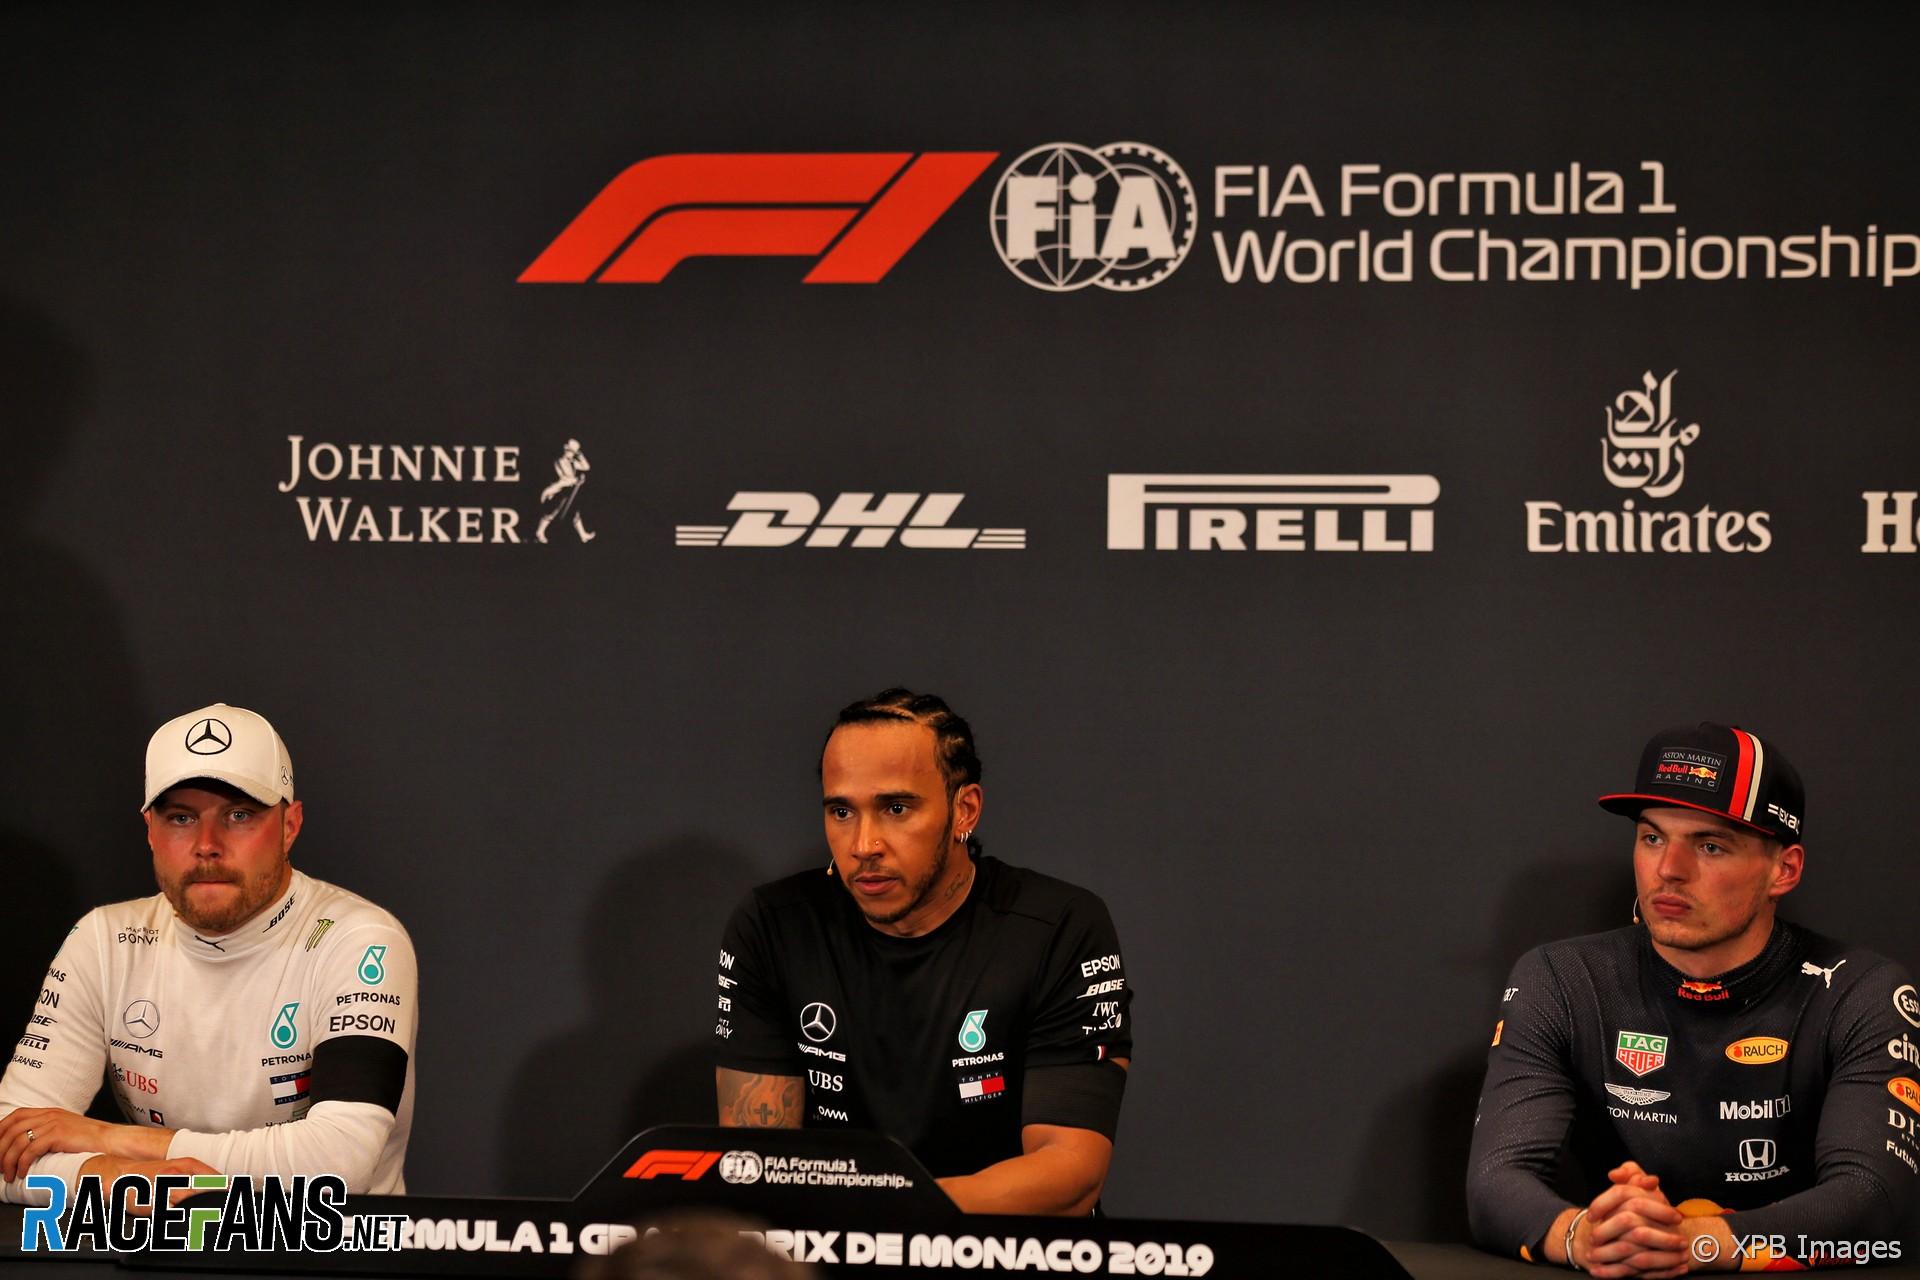 Valtteri Bottas, Lewis Hamilton, Max Verstappen, Monaco, 2019